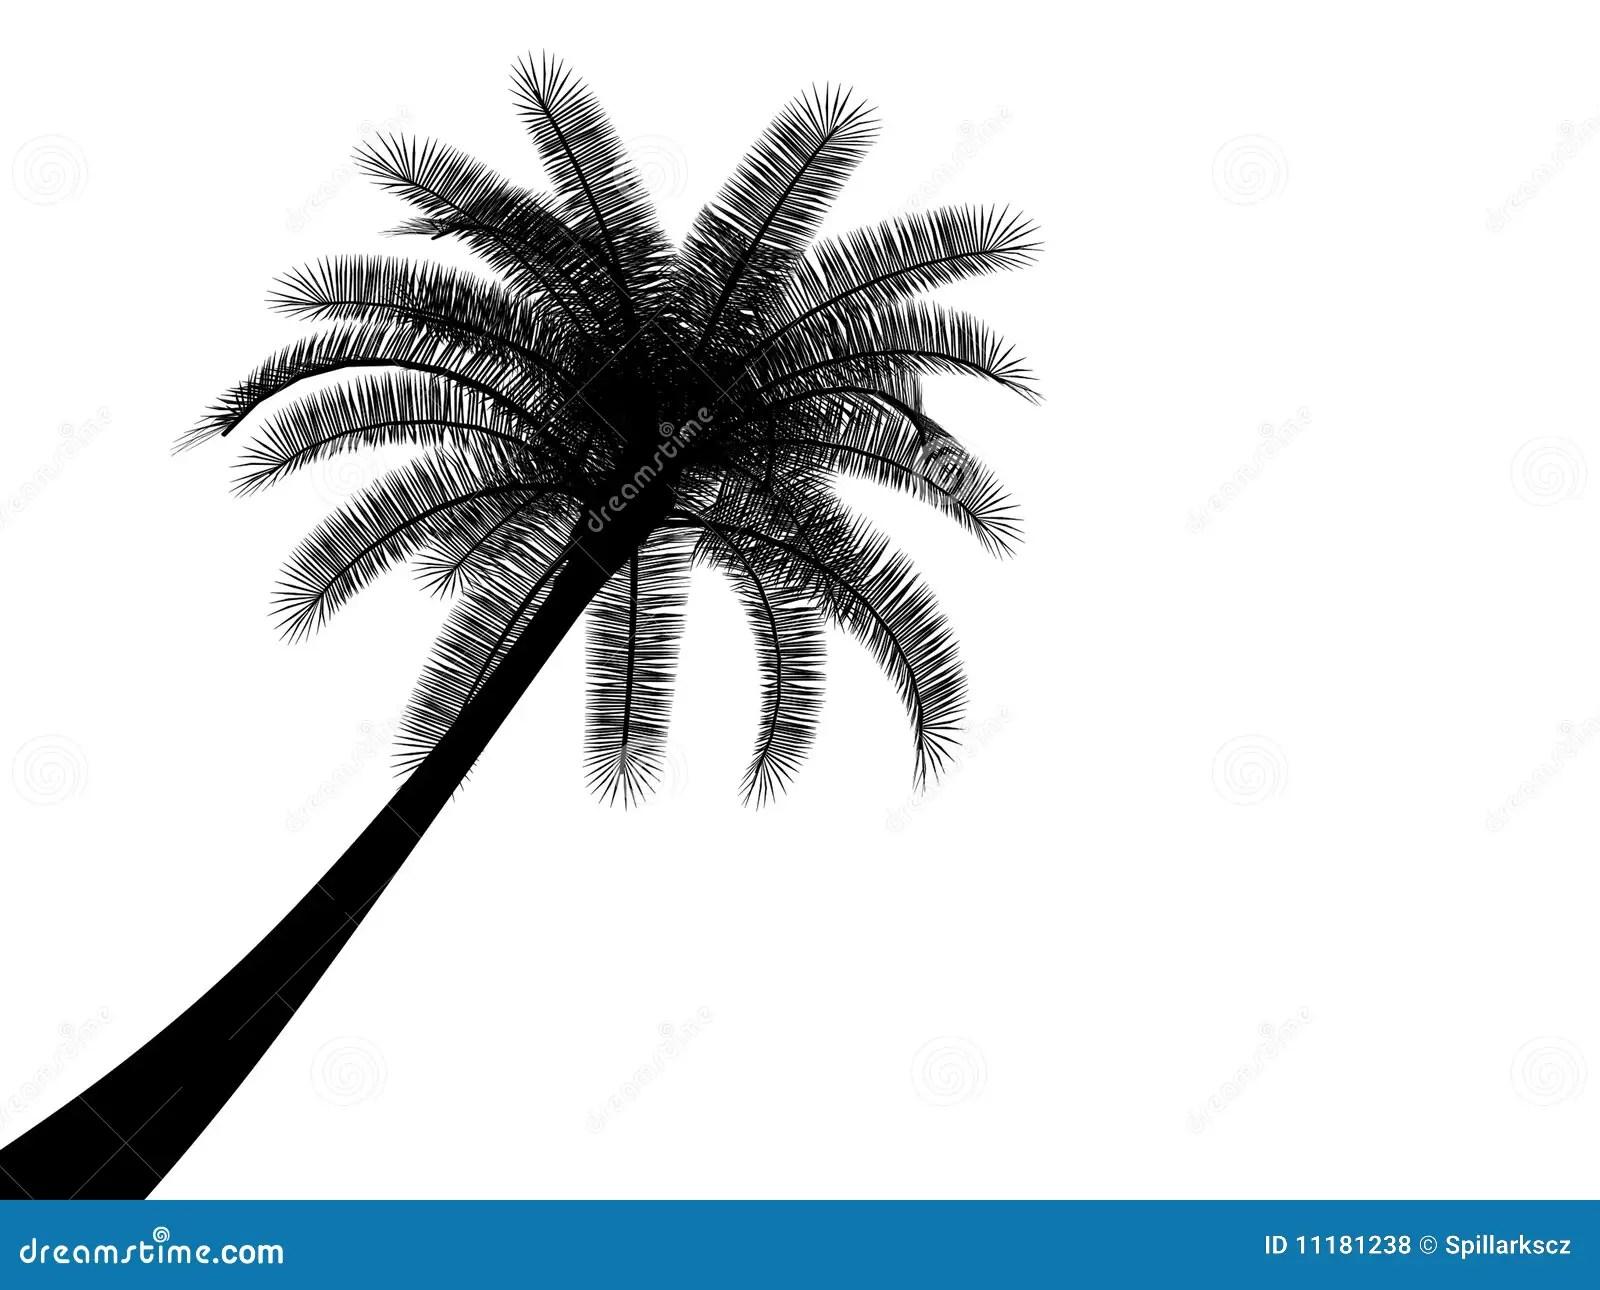 Black And White Tropical Palmtree Palm Tree Royalty Free